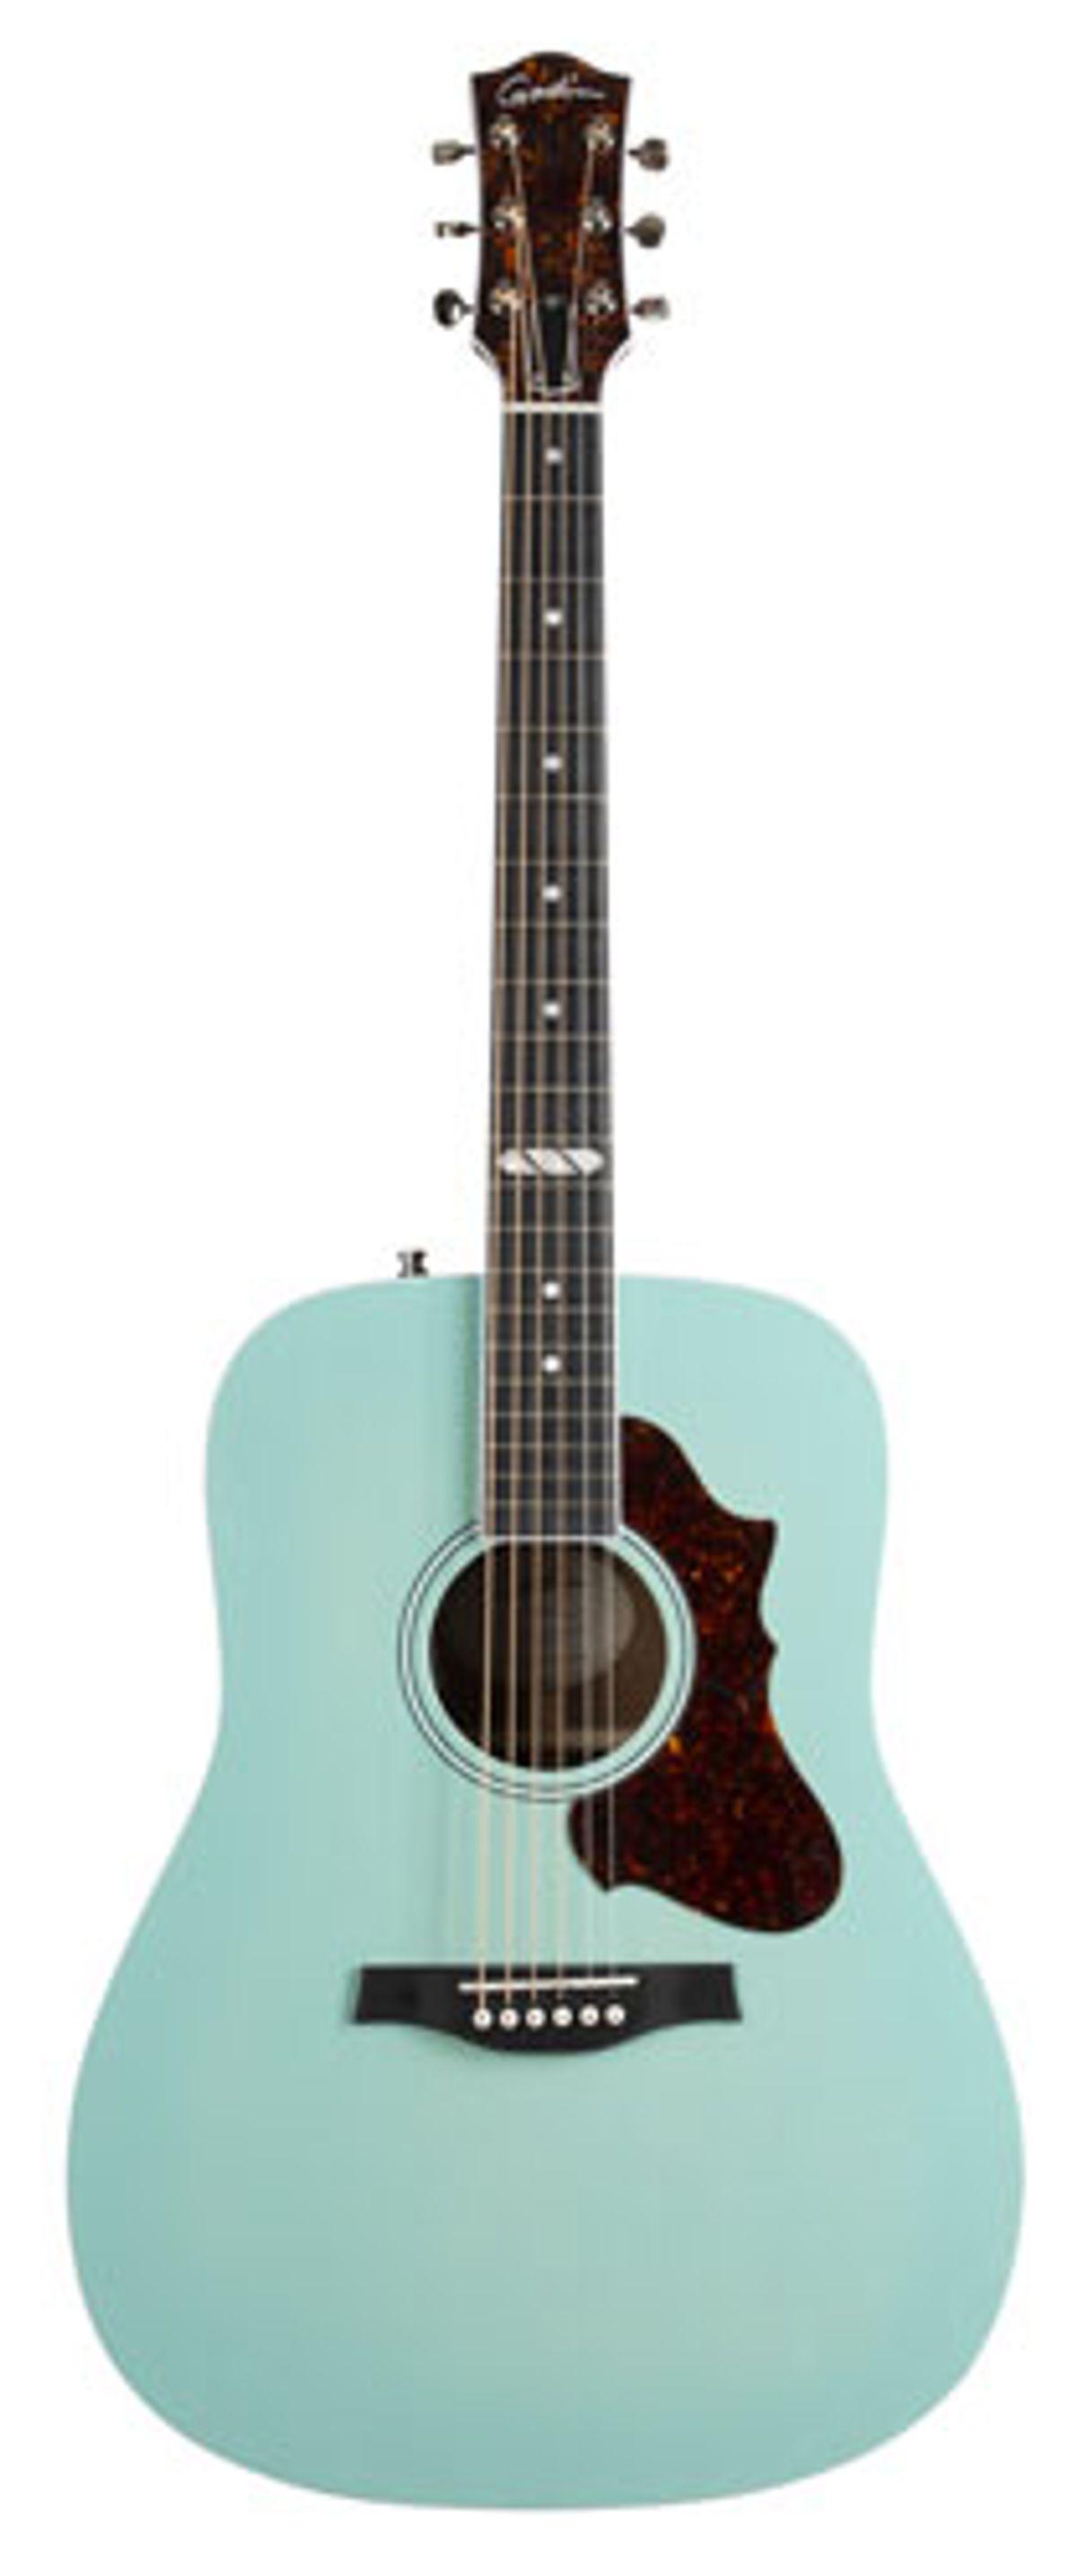 Godin Guitars Launches the Imperial Laguna Blue